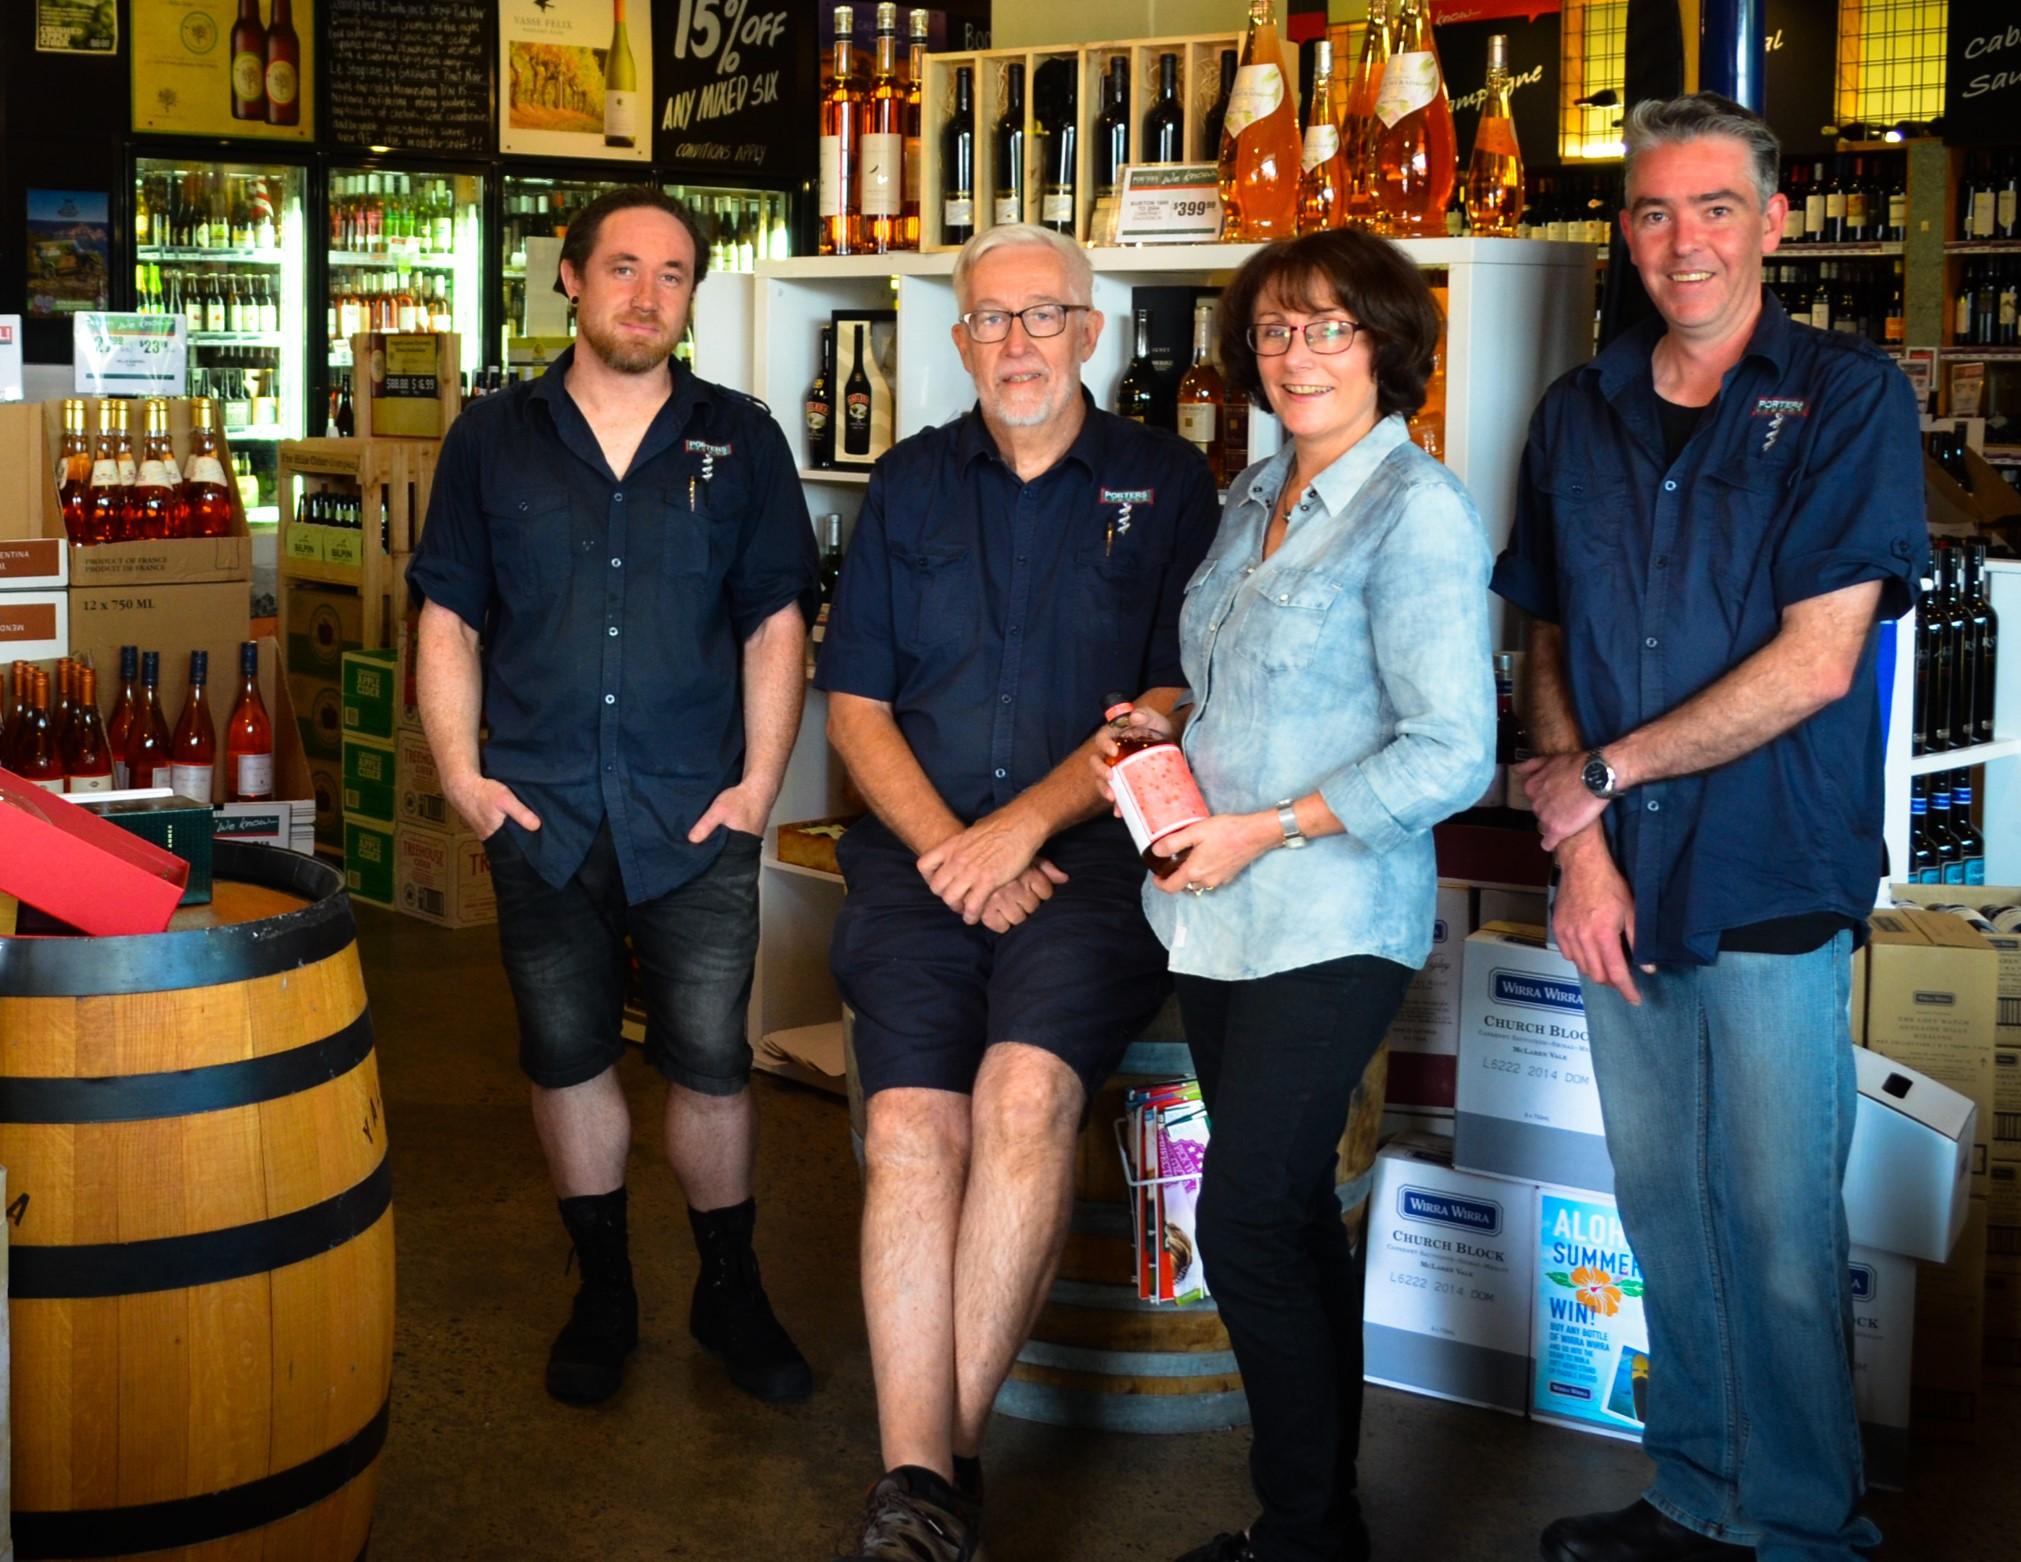 Porter's Team: Jason Hain, Steve Murray, Karen Nicholls and Ian Nicholson